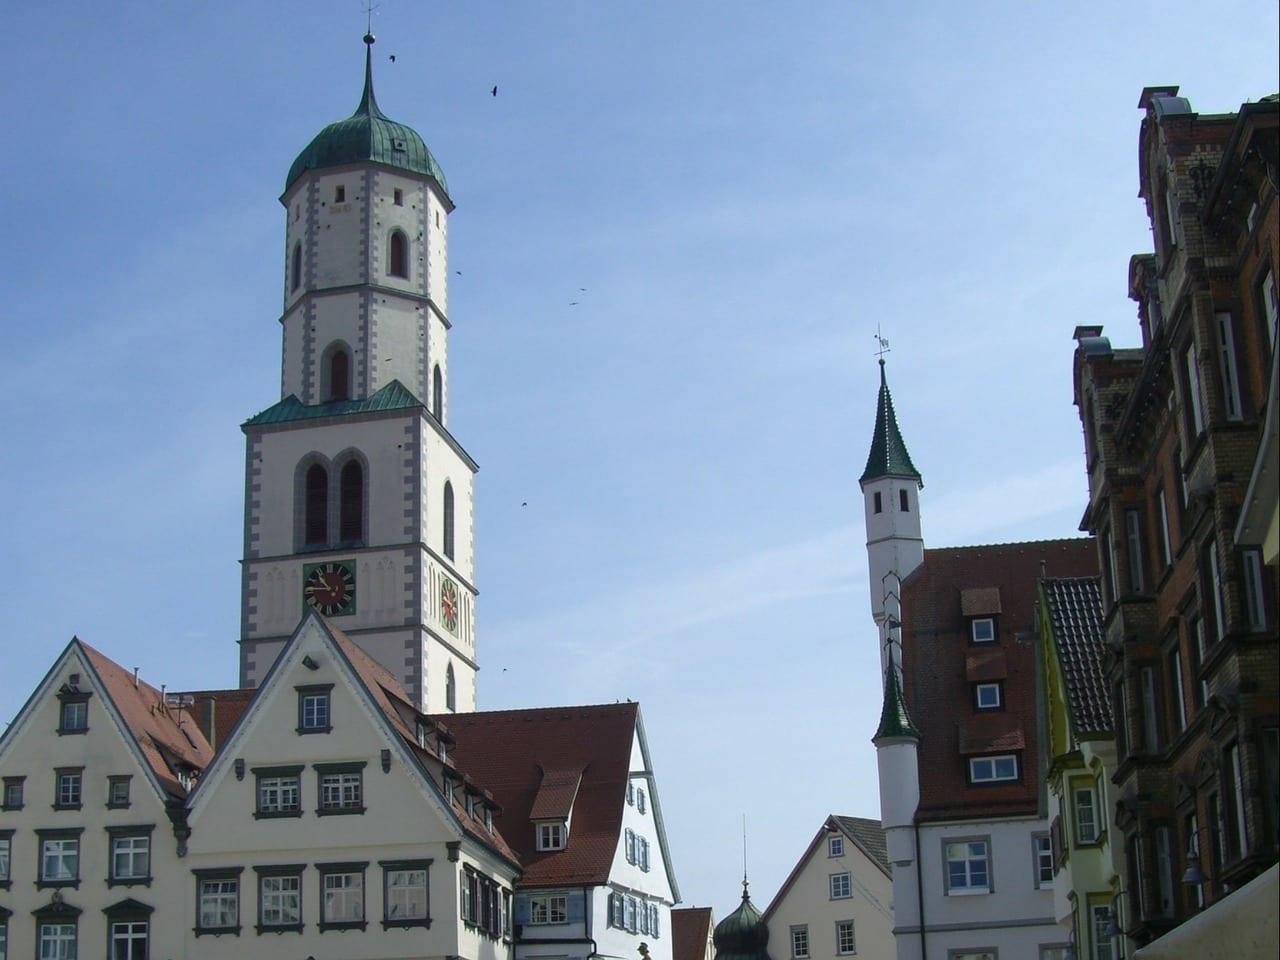 Biberach, Germany - a nice town to visit when cycling the Donau-Bodensee Radweg